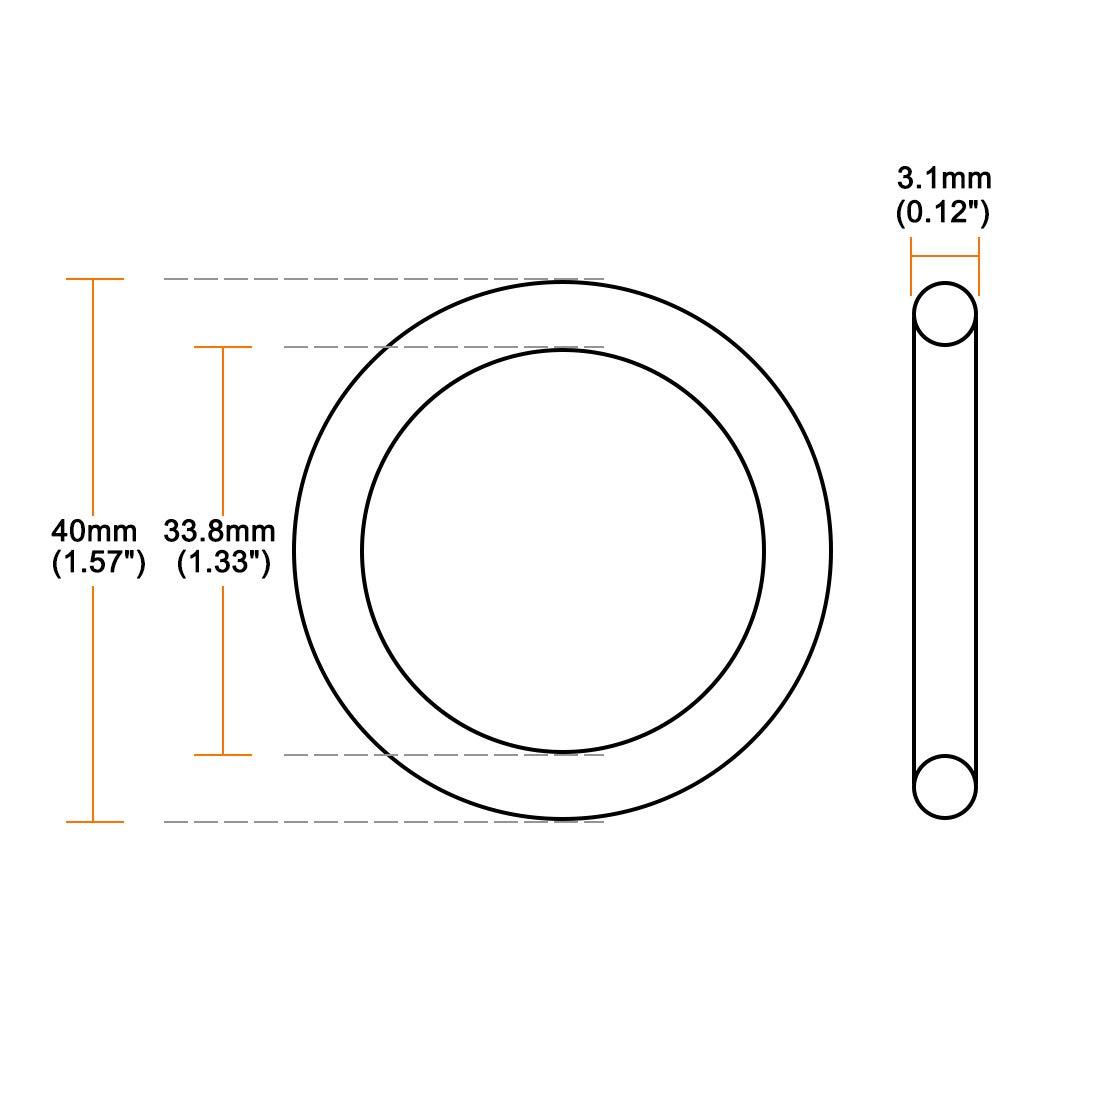 sourcing map 20pcs O-Ring Nitrilkautschuk Gummi 61,8mm x 68mm x 3,1mm Dichtungsringe Dichtung DE de